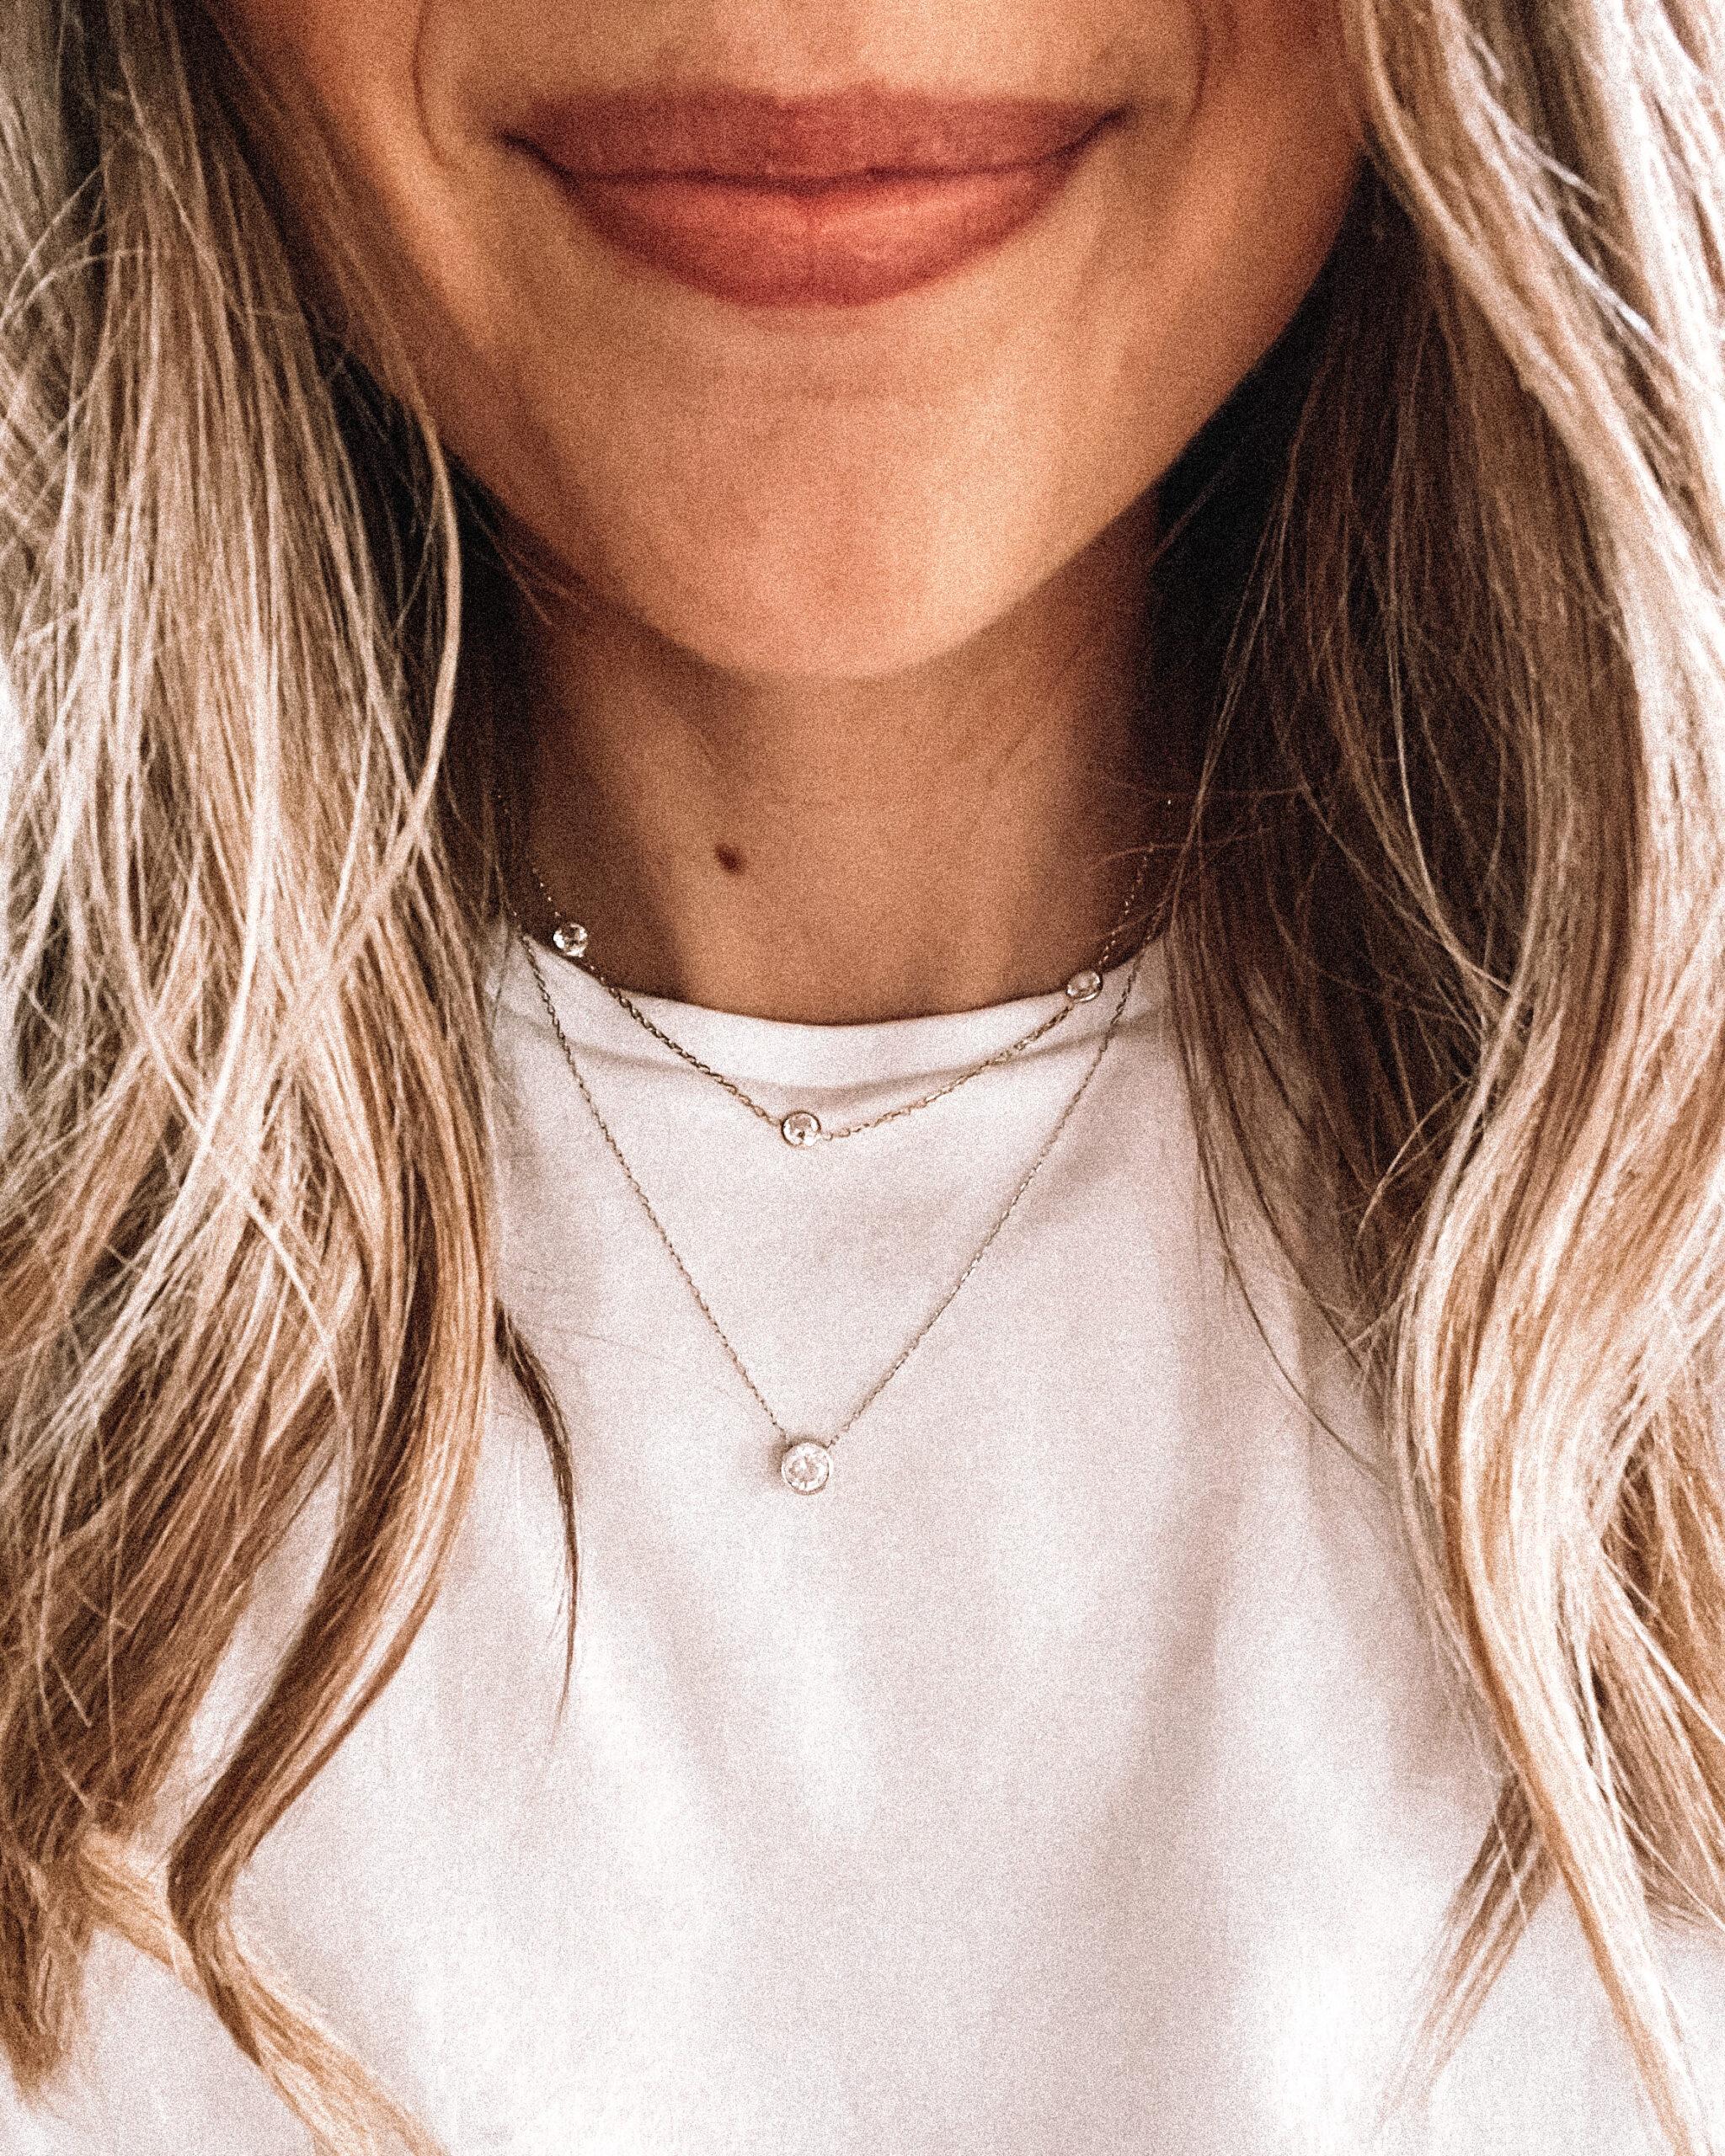 Fashion Jackson Wearing Amazon Fashion Jewelry Gold CZ Diamond Station Necklace